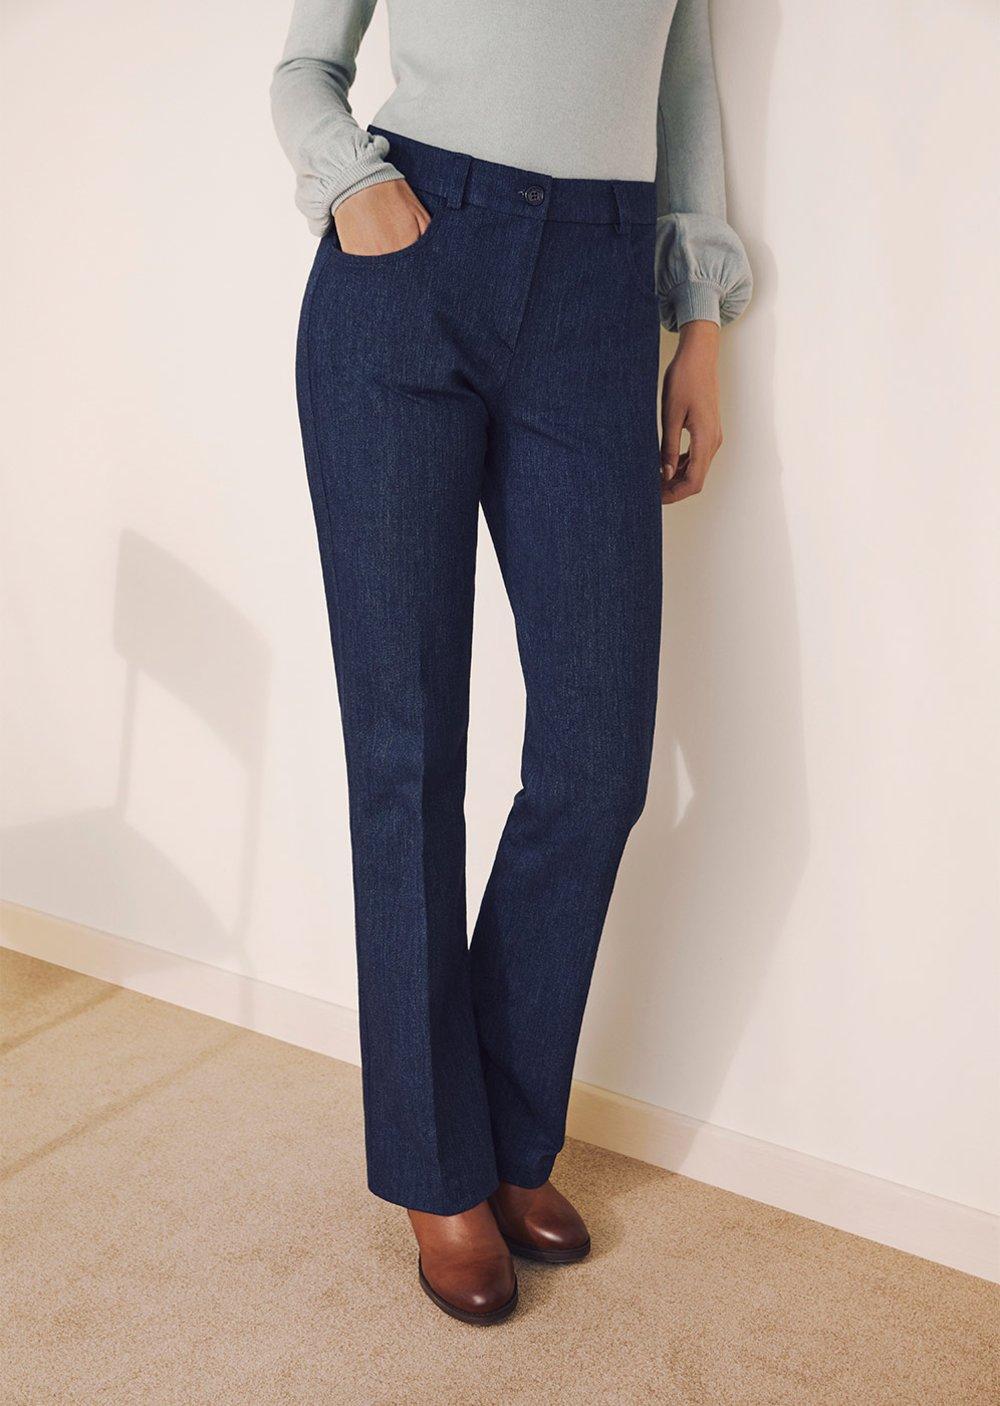 Pantalone Cindy cotone effetto denim - Blue - Donna